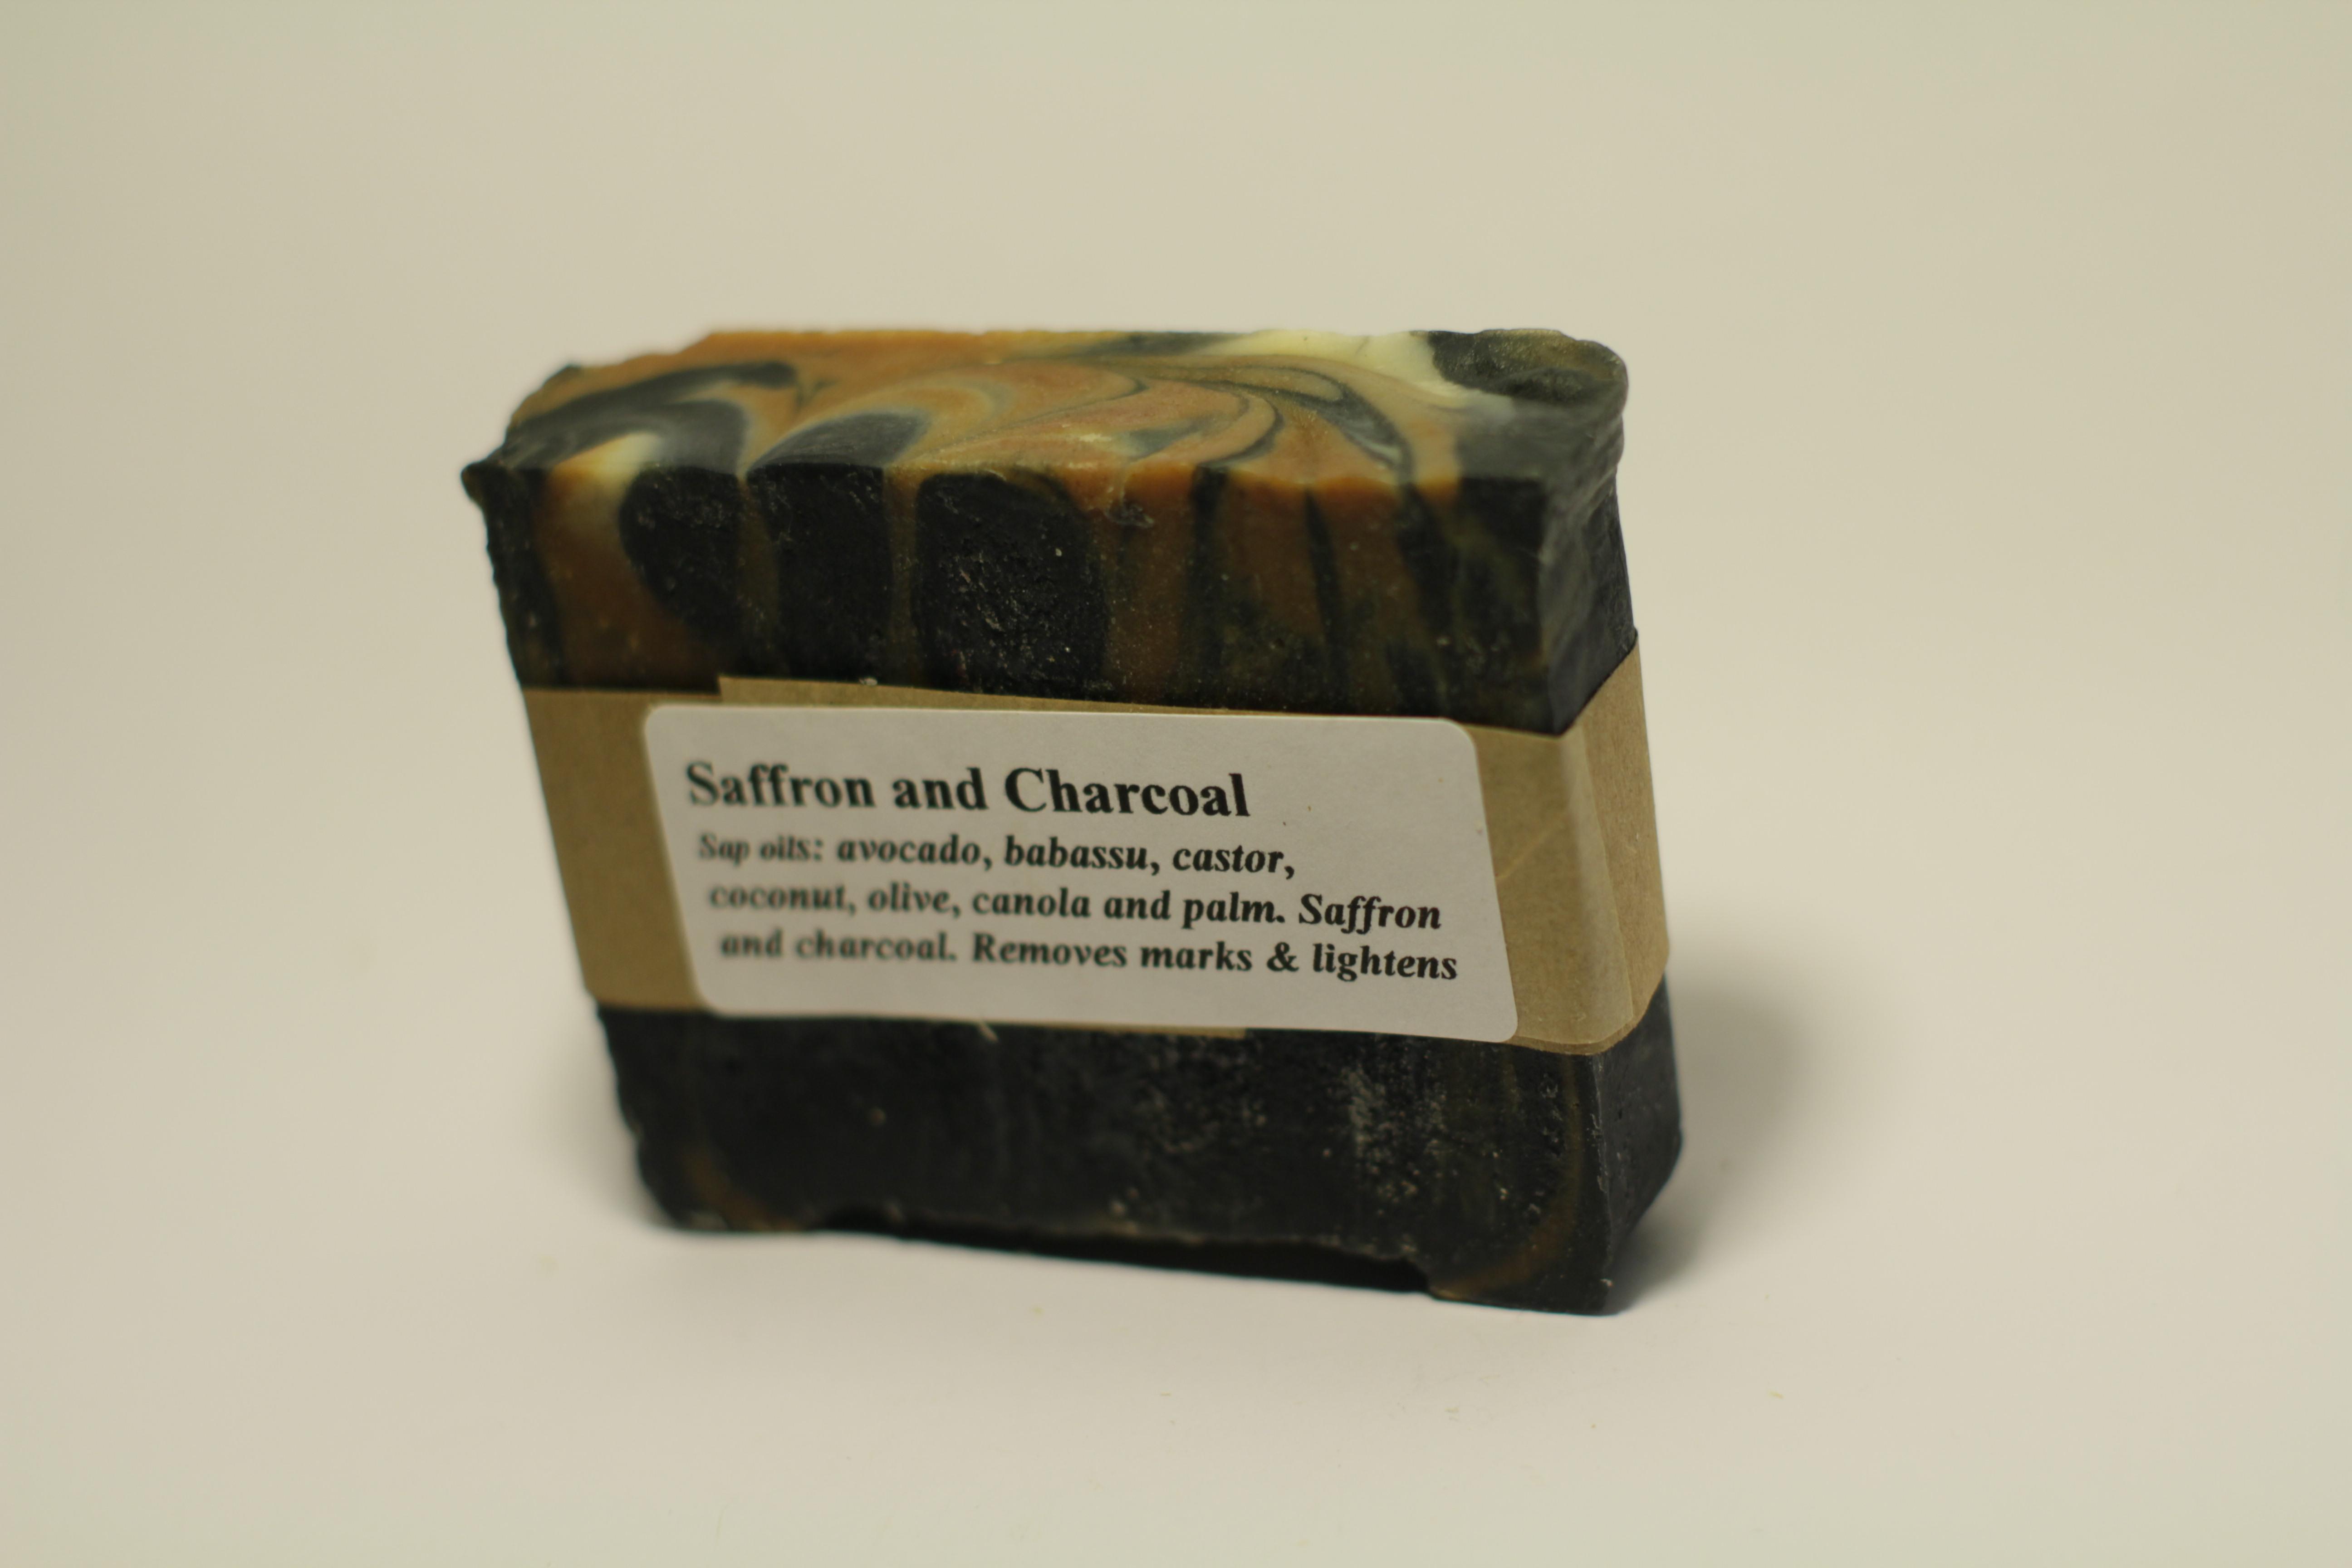 Saffron and Charcoal